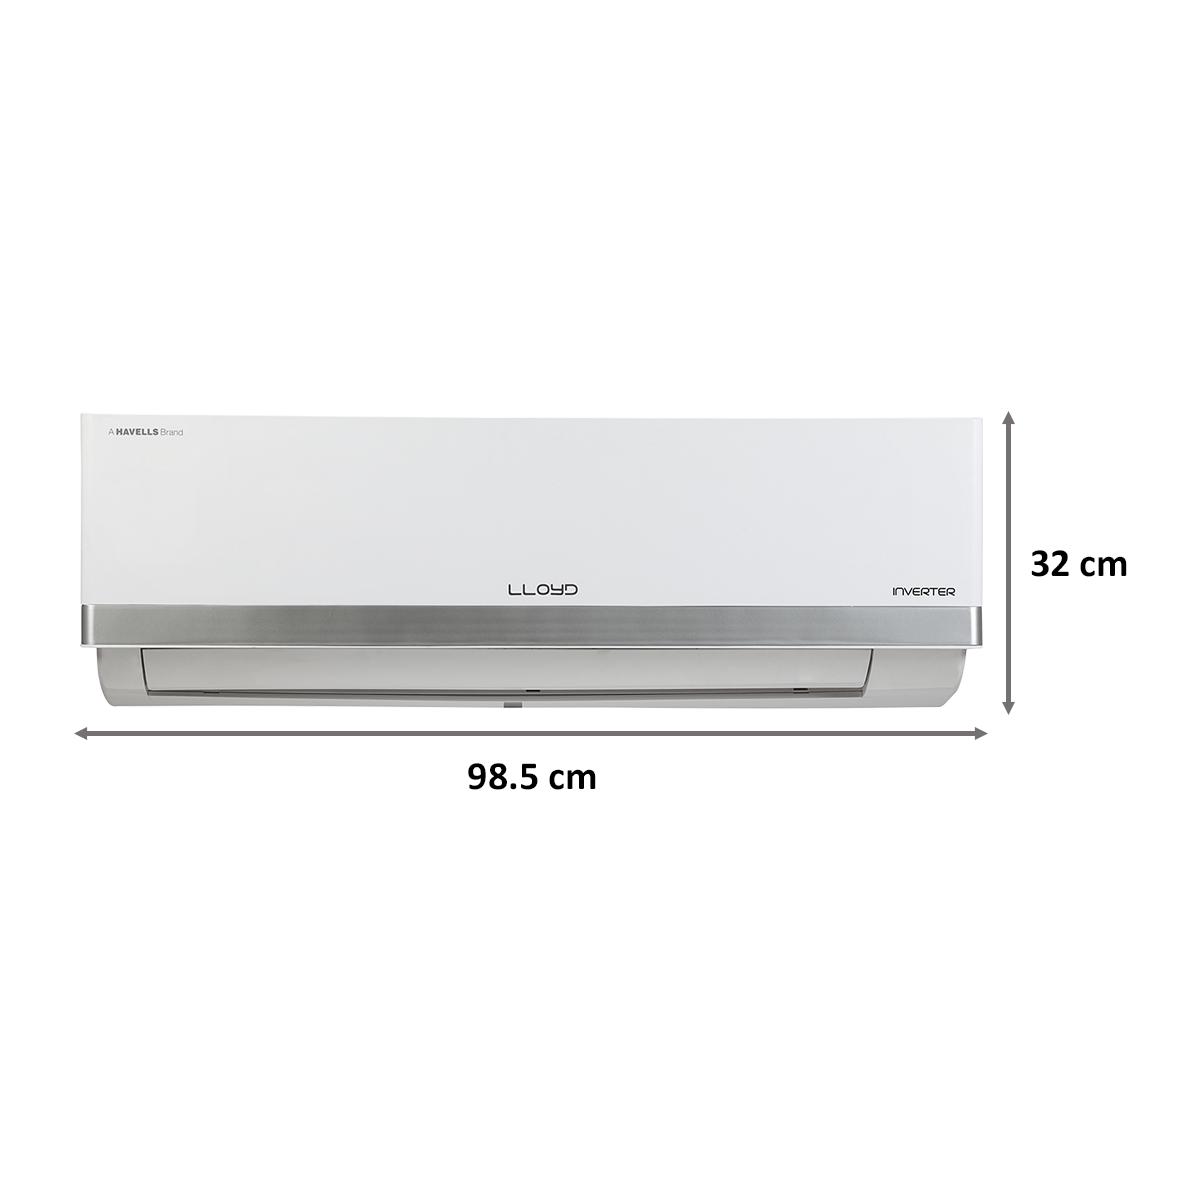 Lloyd BP 1.5 Ton 3 Star Inverter Split AC (Copper Condenser, GLS18I36WSBP, White)_3